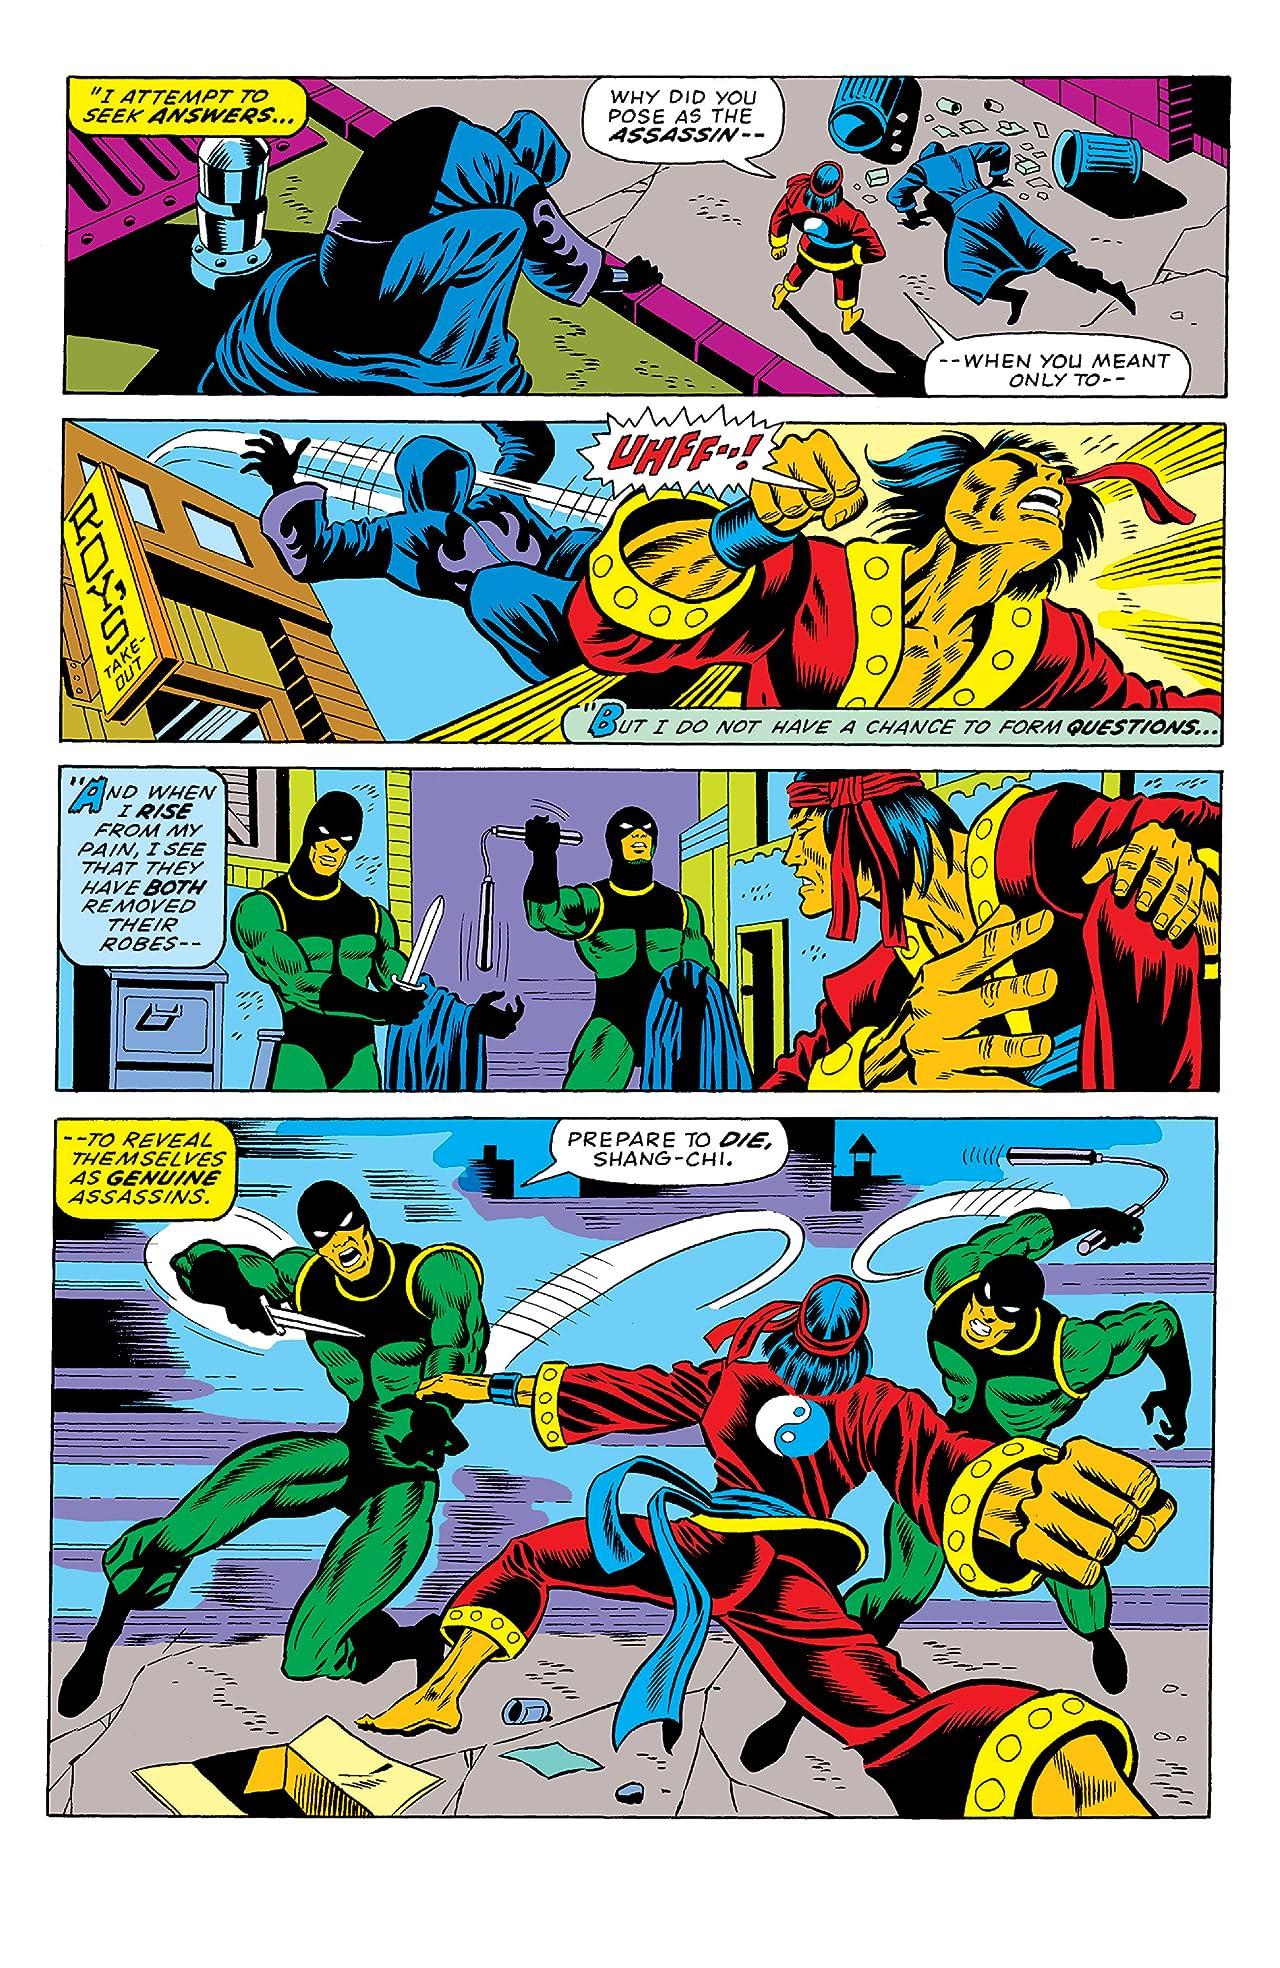 Giant-Size Master of Kung Fu (1974-1975) #1